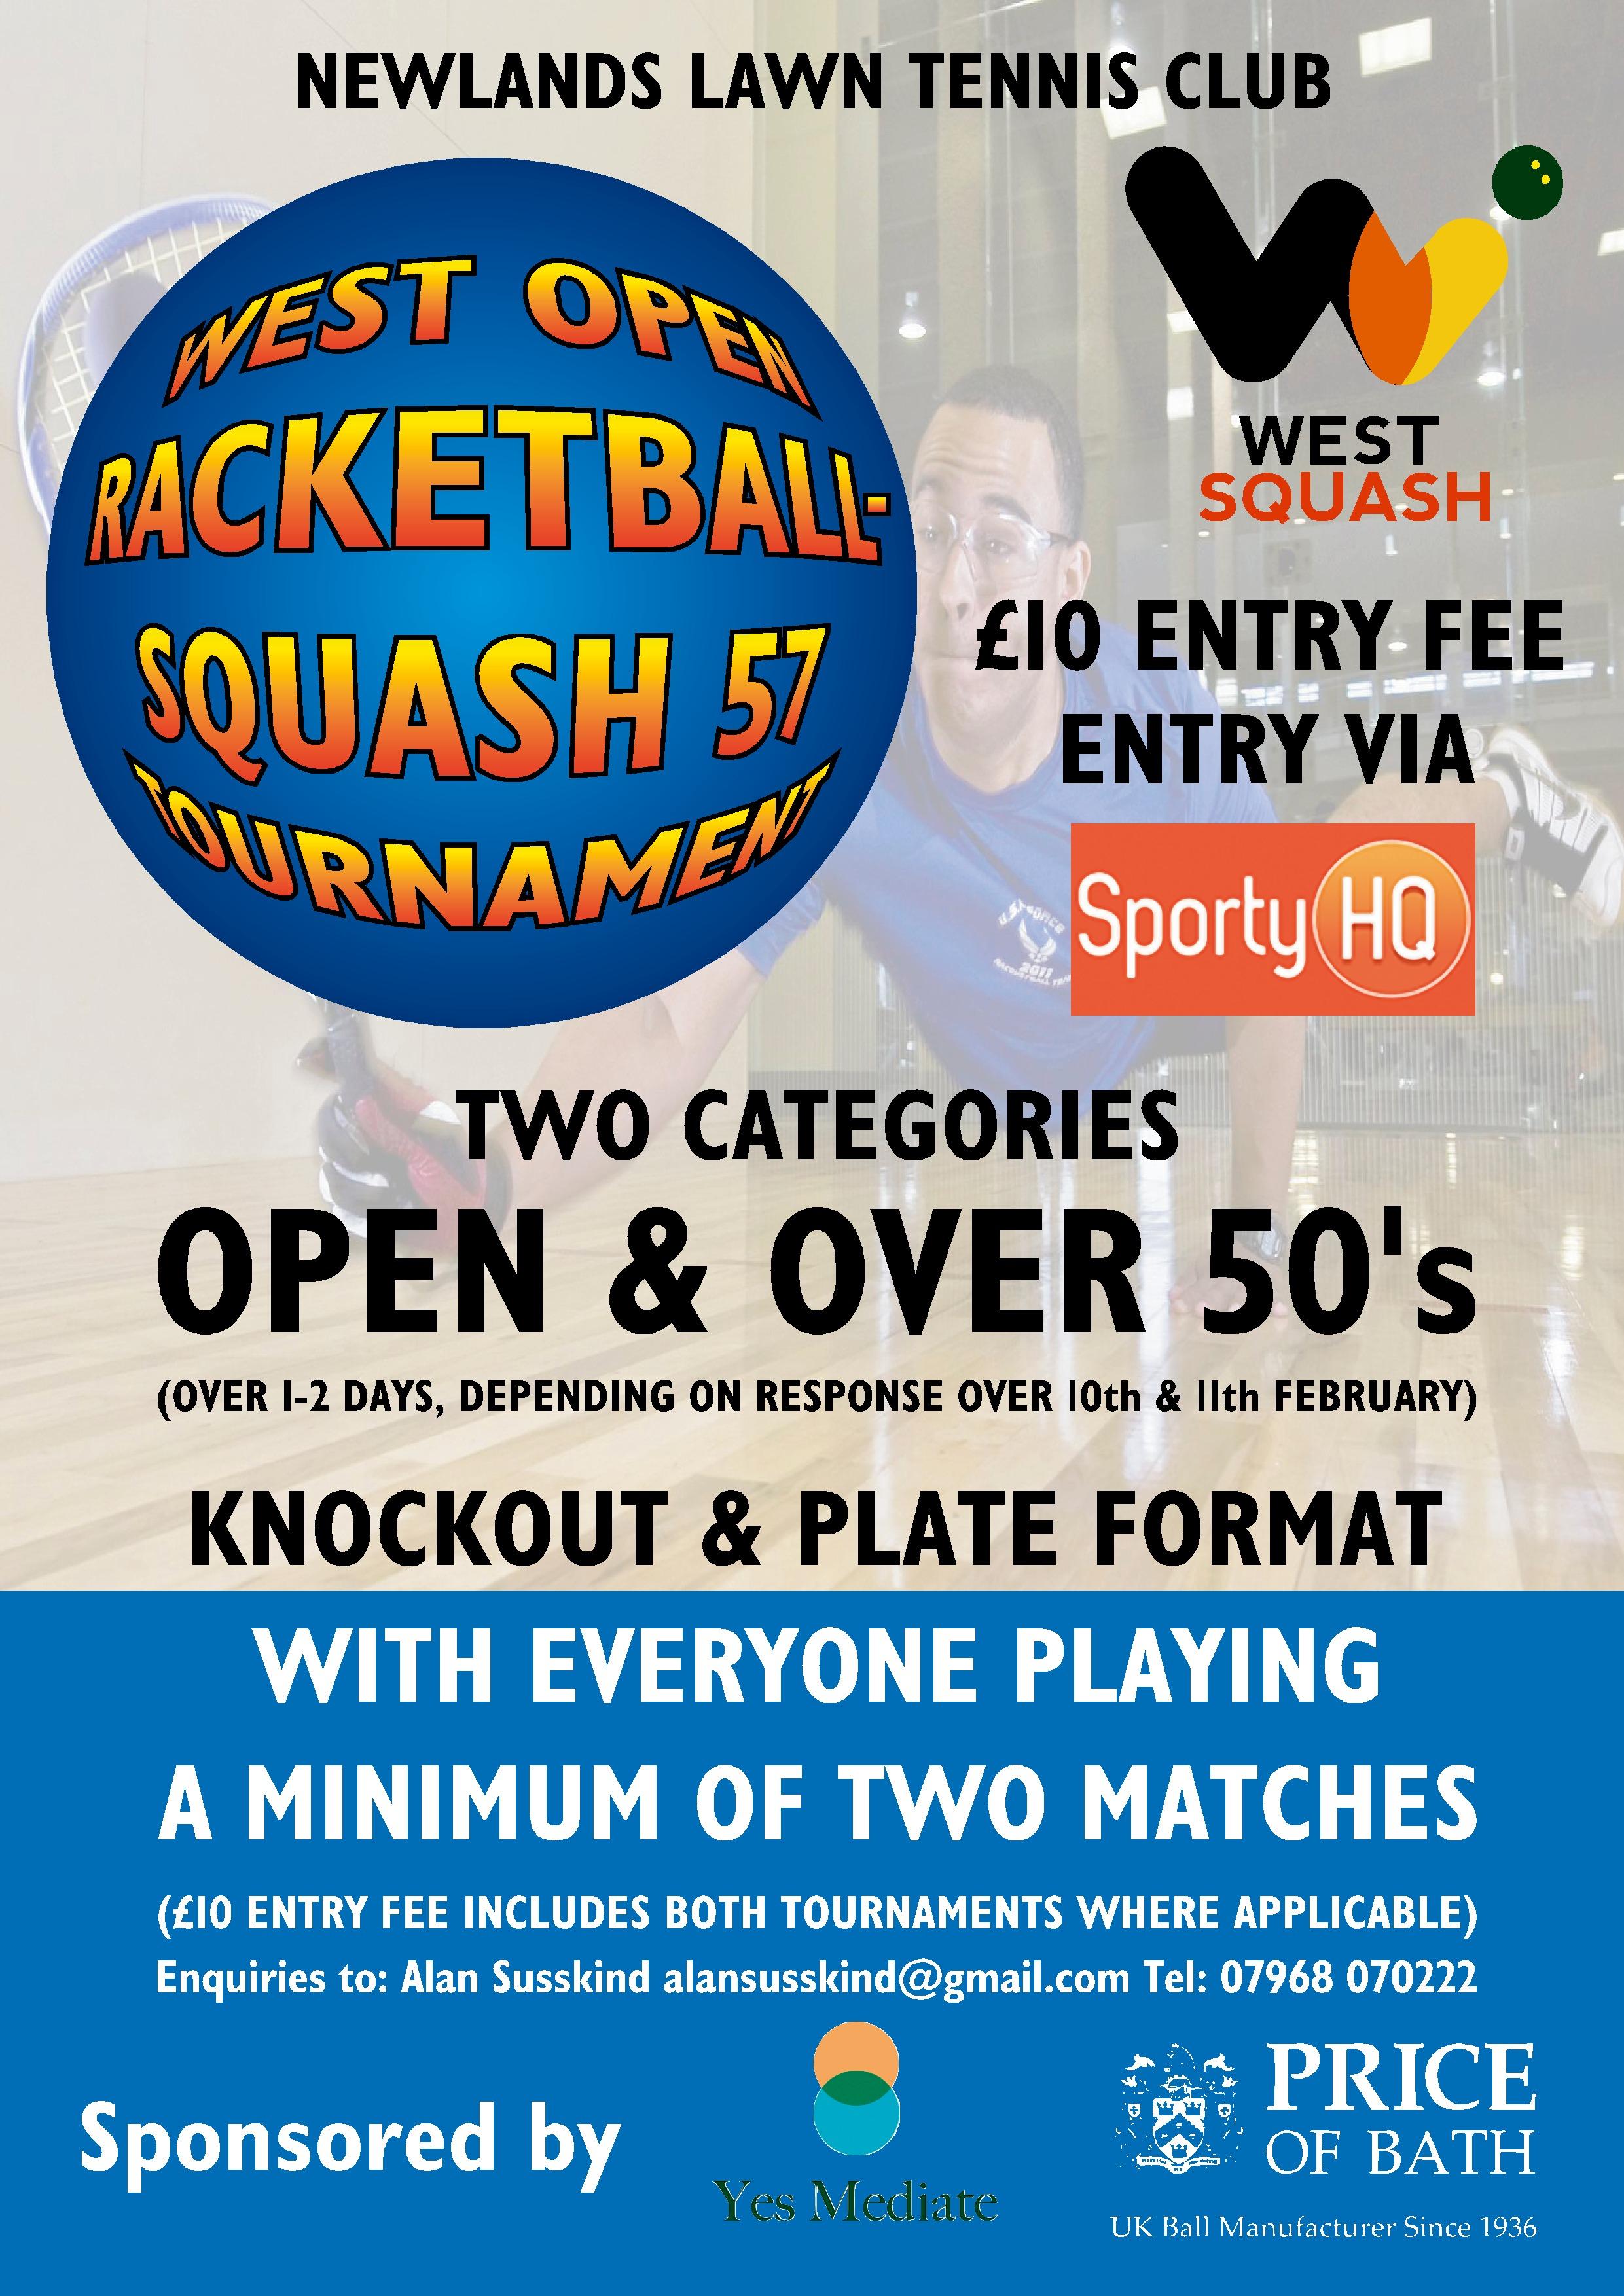 West Open Racketball Squash 57 Tournament